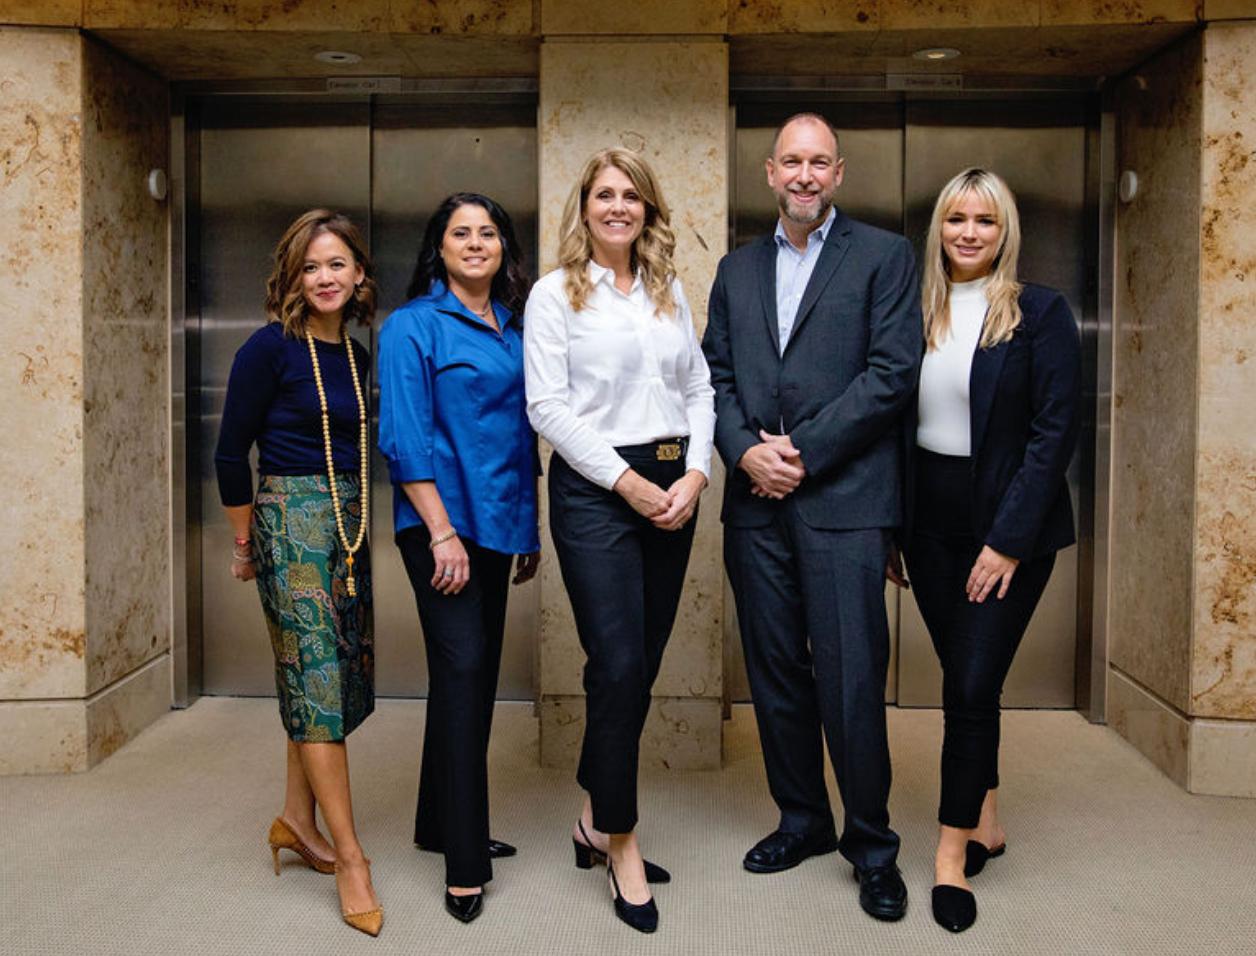 color photo of RHO Residential team left-to-right: Angelica Facchini, Gabriel Buchanan, Brenda Cicoe, Tim Kelly and Gina Barretti